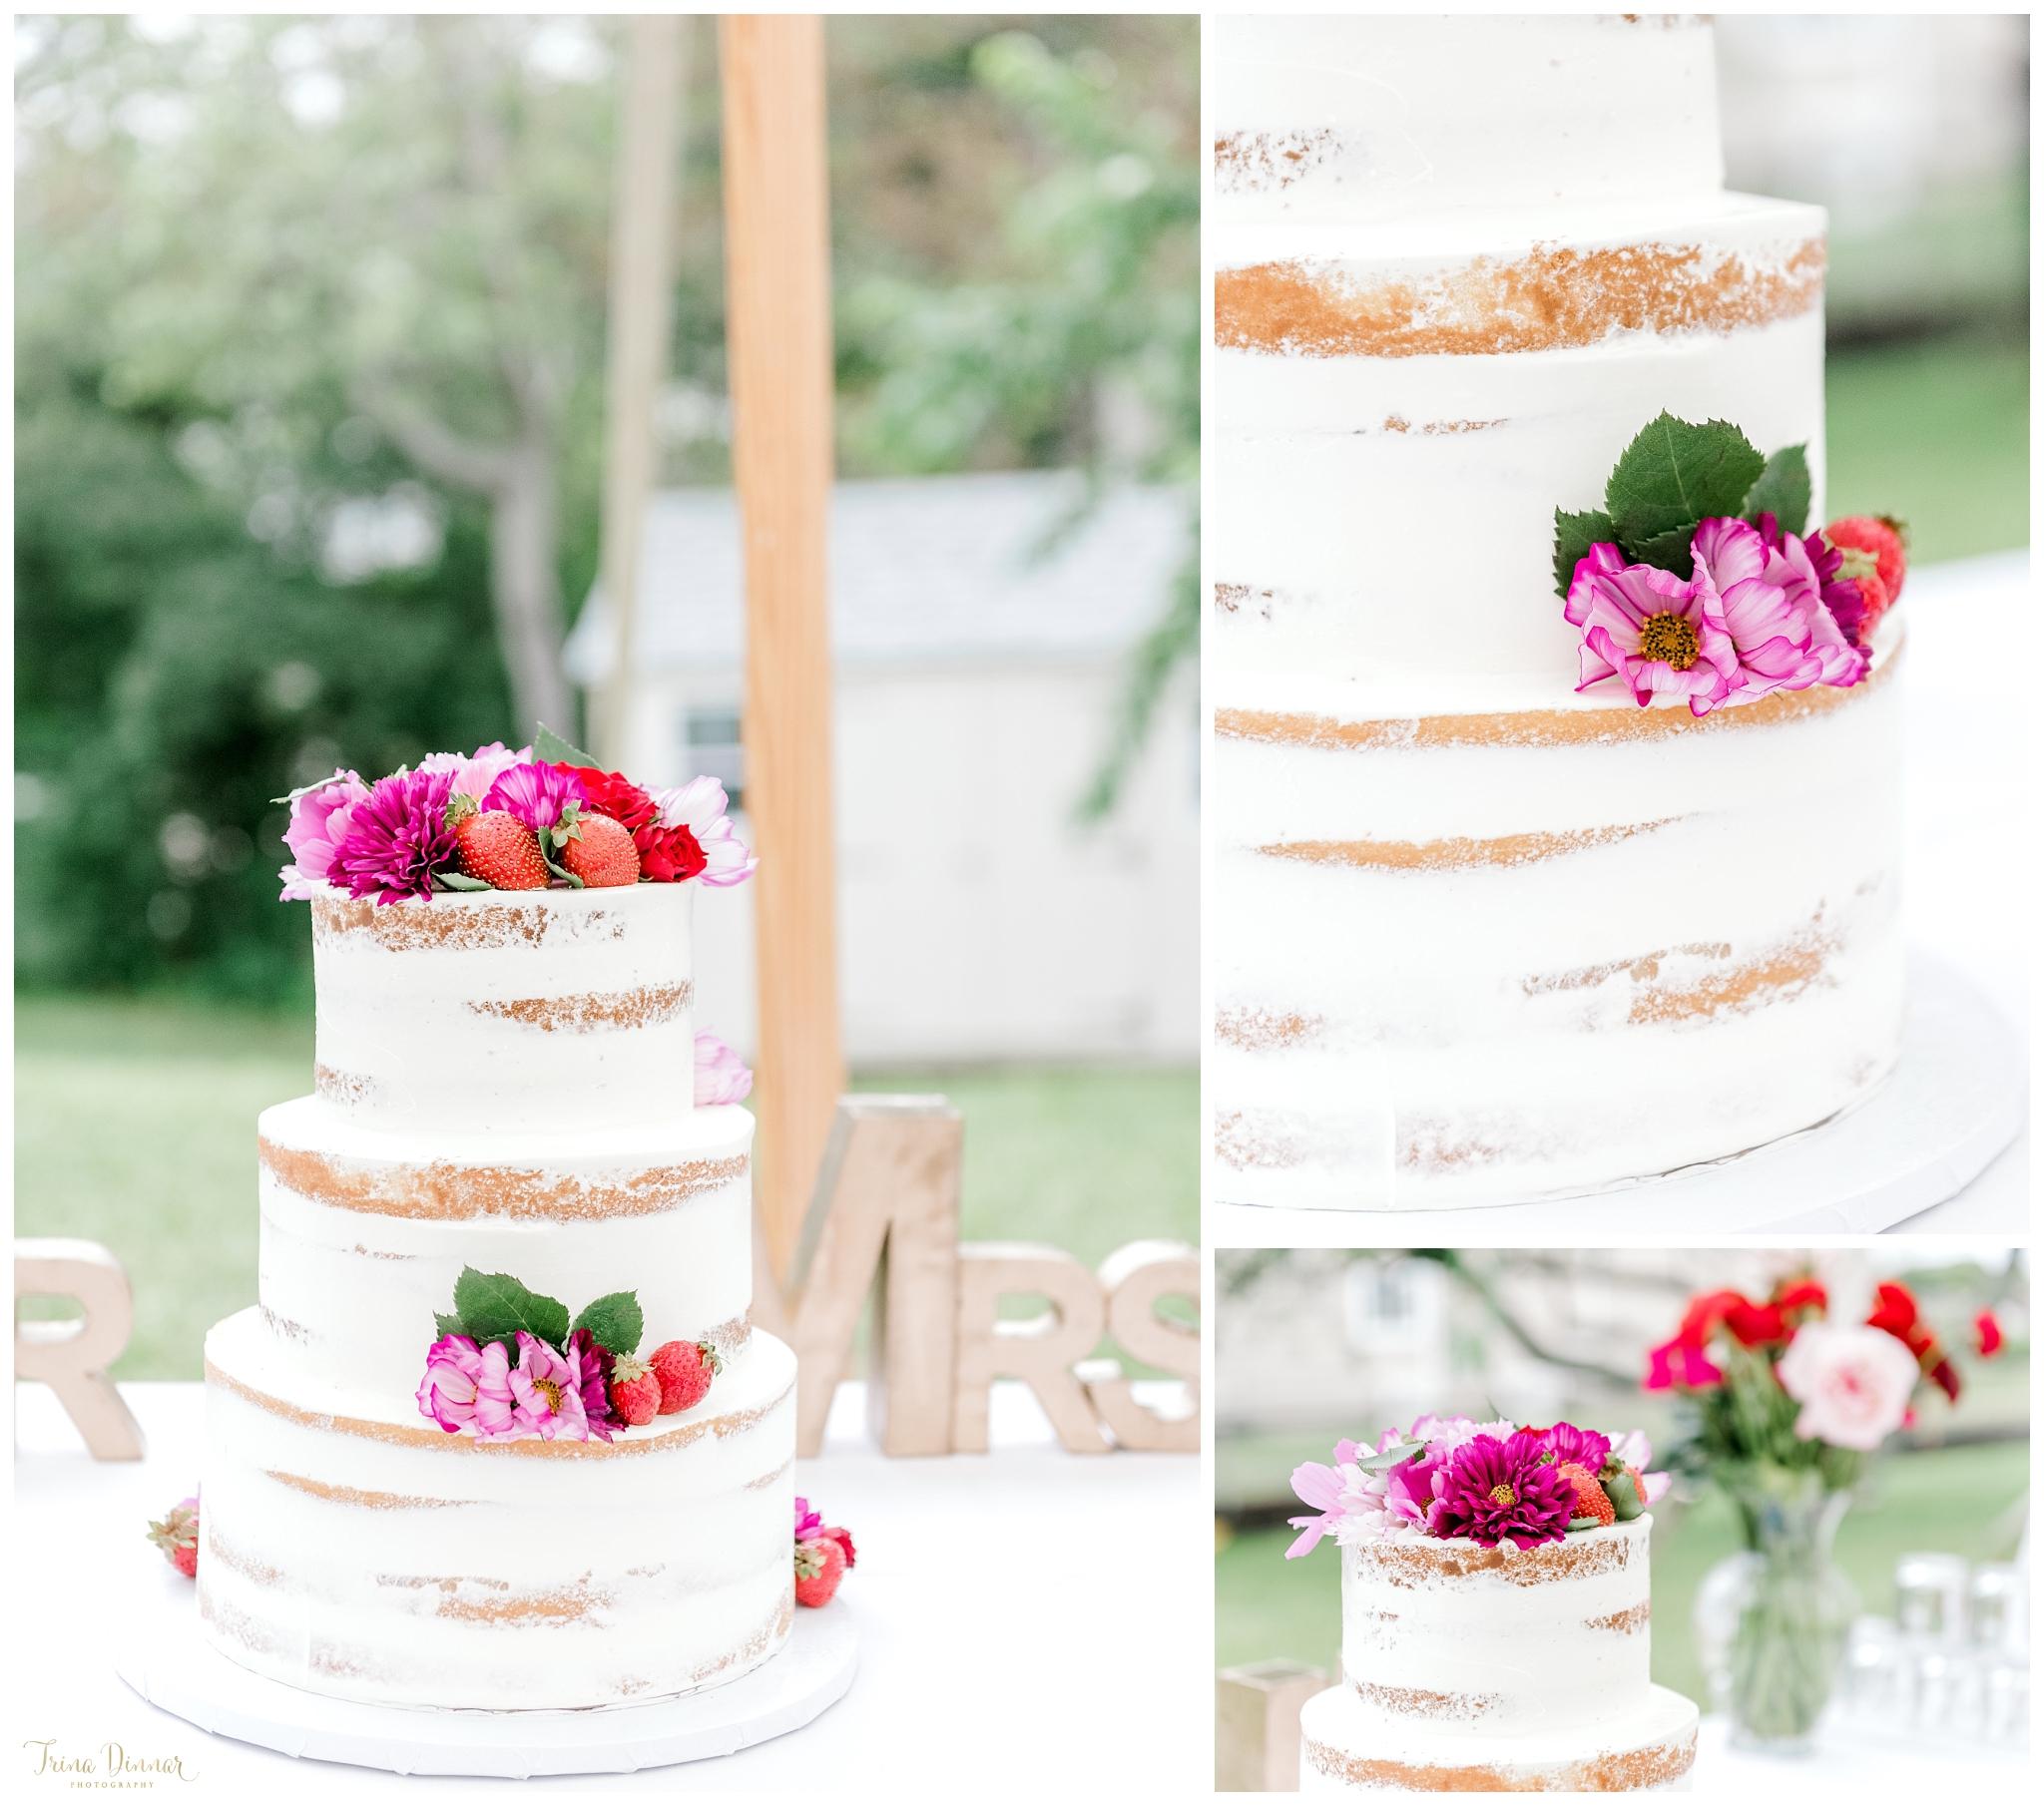 Scratch Baking Co Maine Wedding Cake